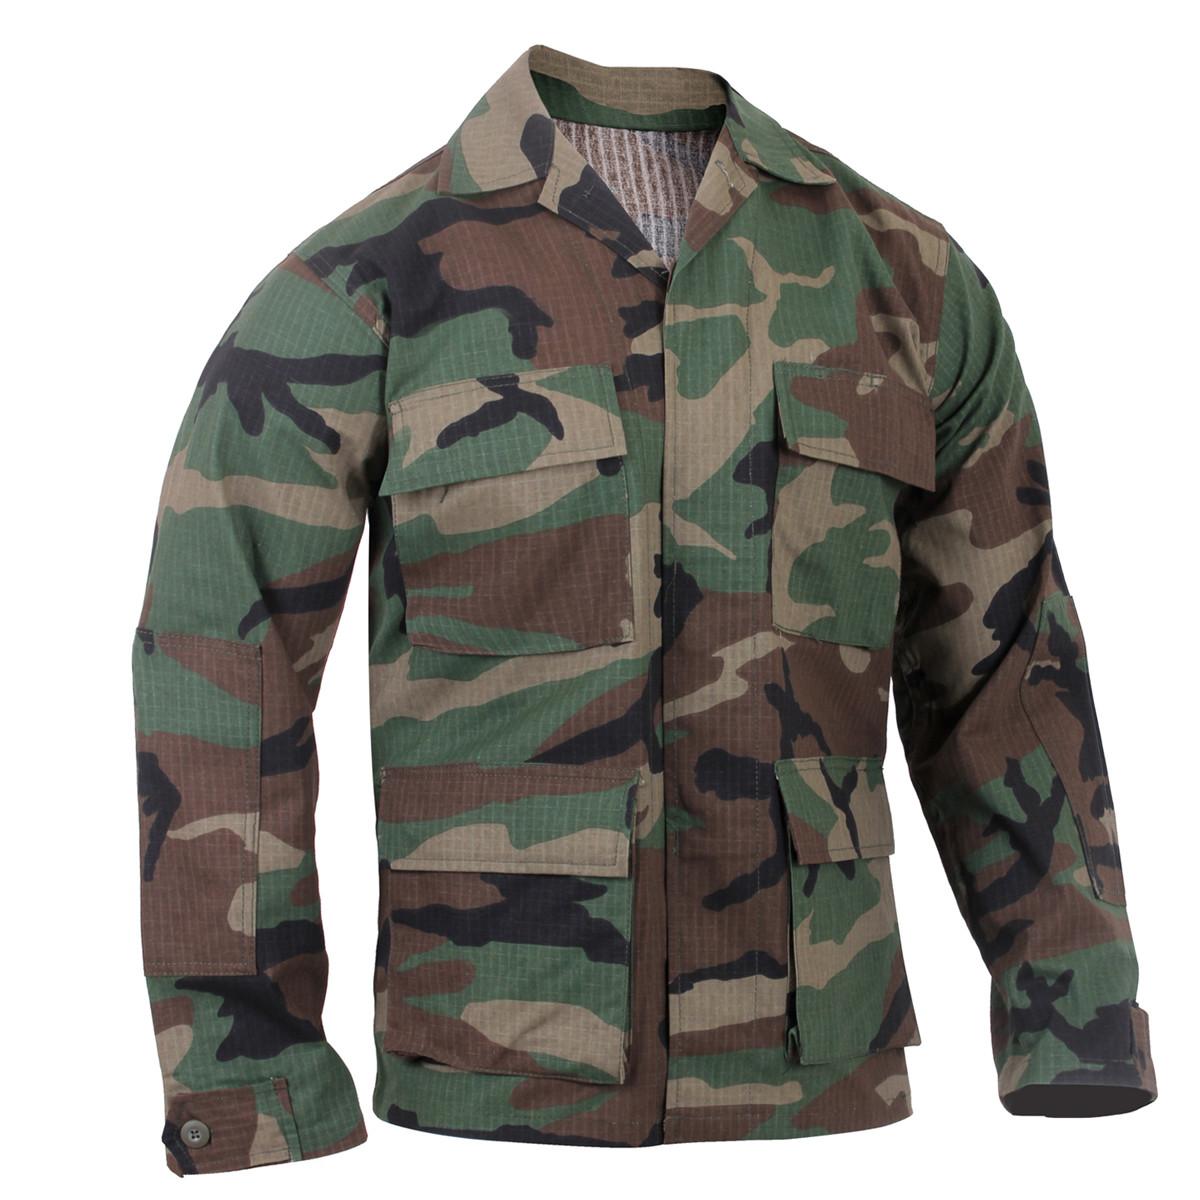 e9aa5d69b8db3 Shop Woodland Camo Ripstop Cotton BDU Jackets- Fatigues Army Navy Gear